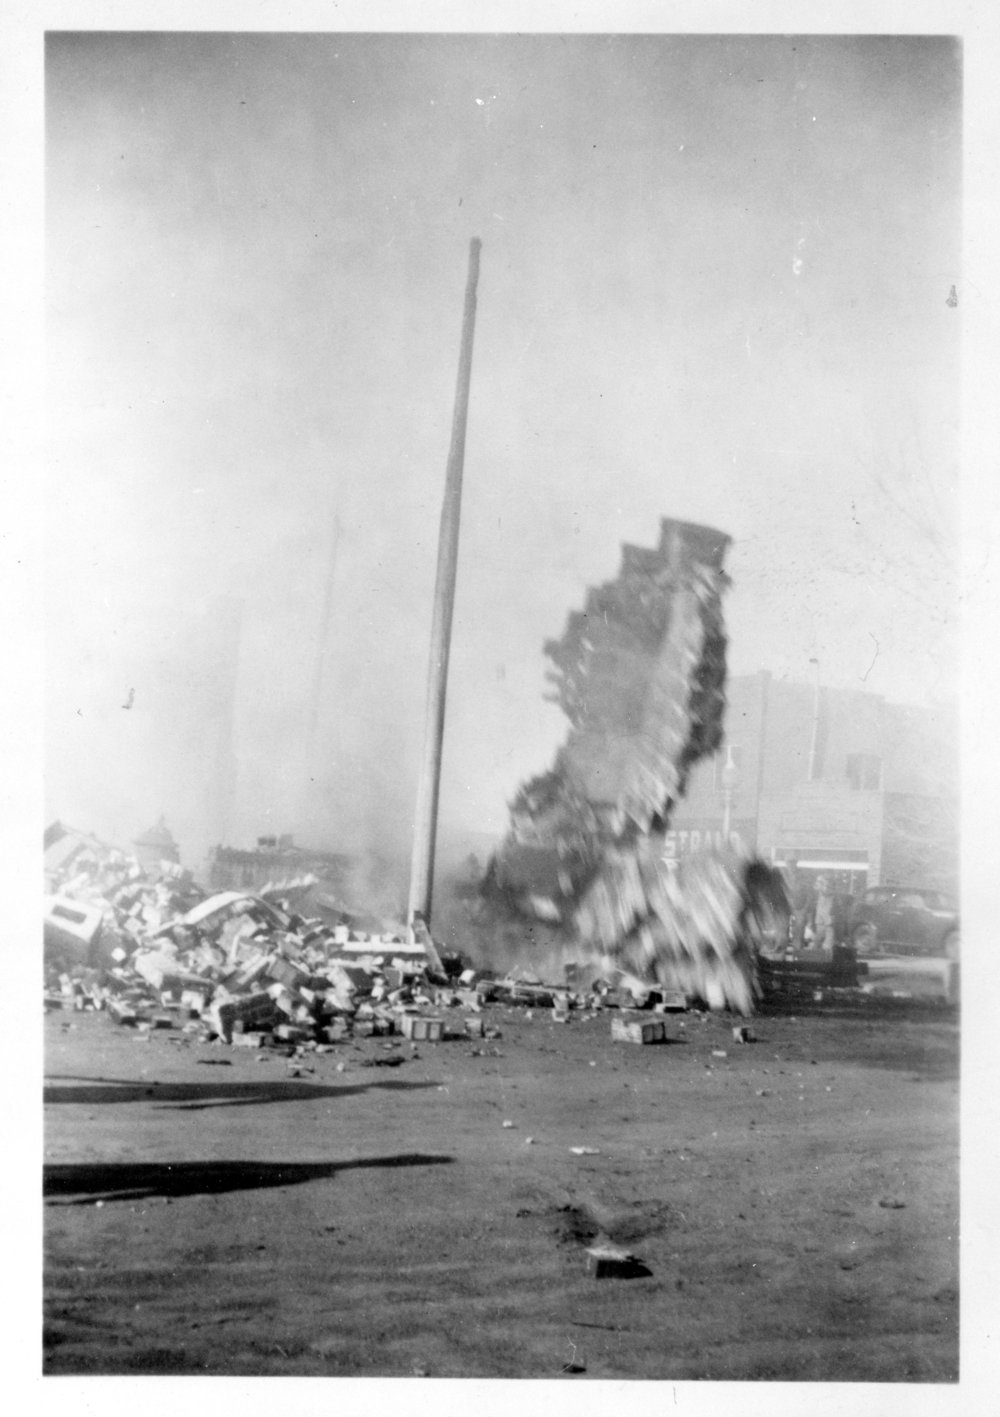 City building fire, Ransom, Kansas - 4